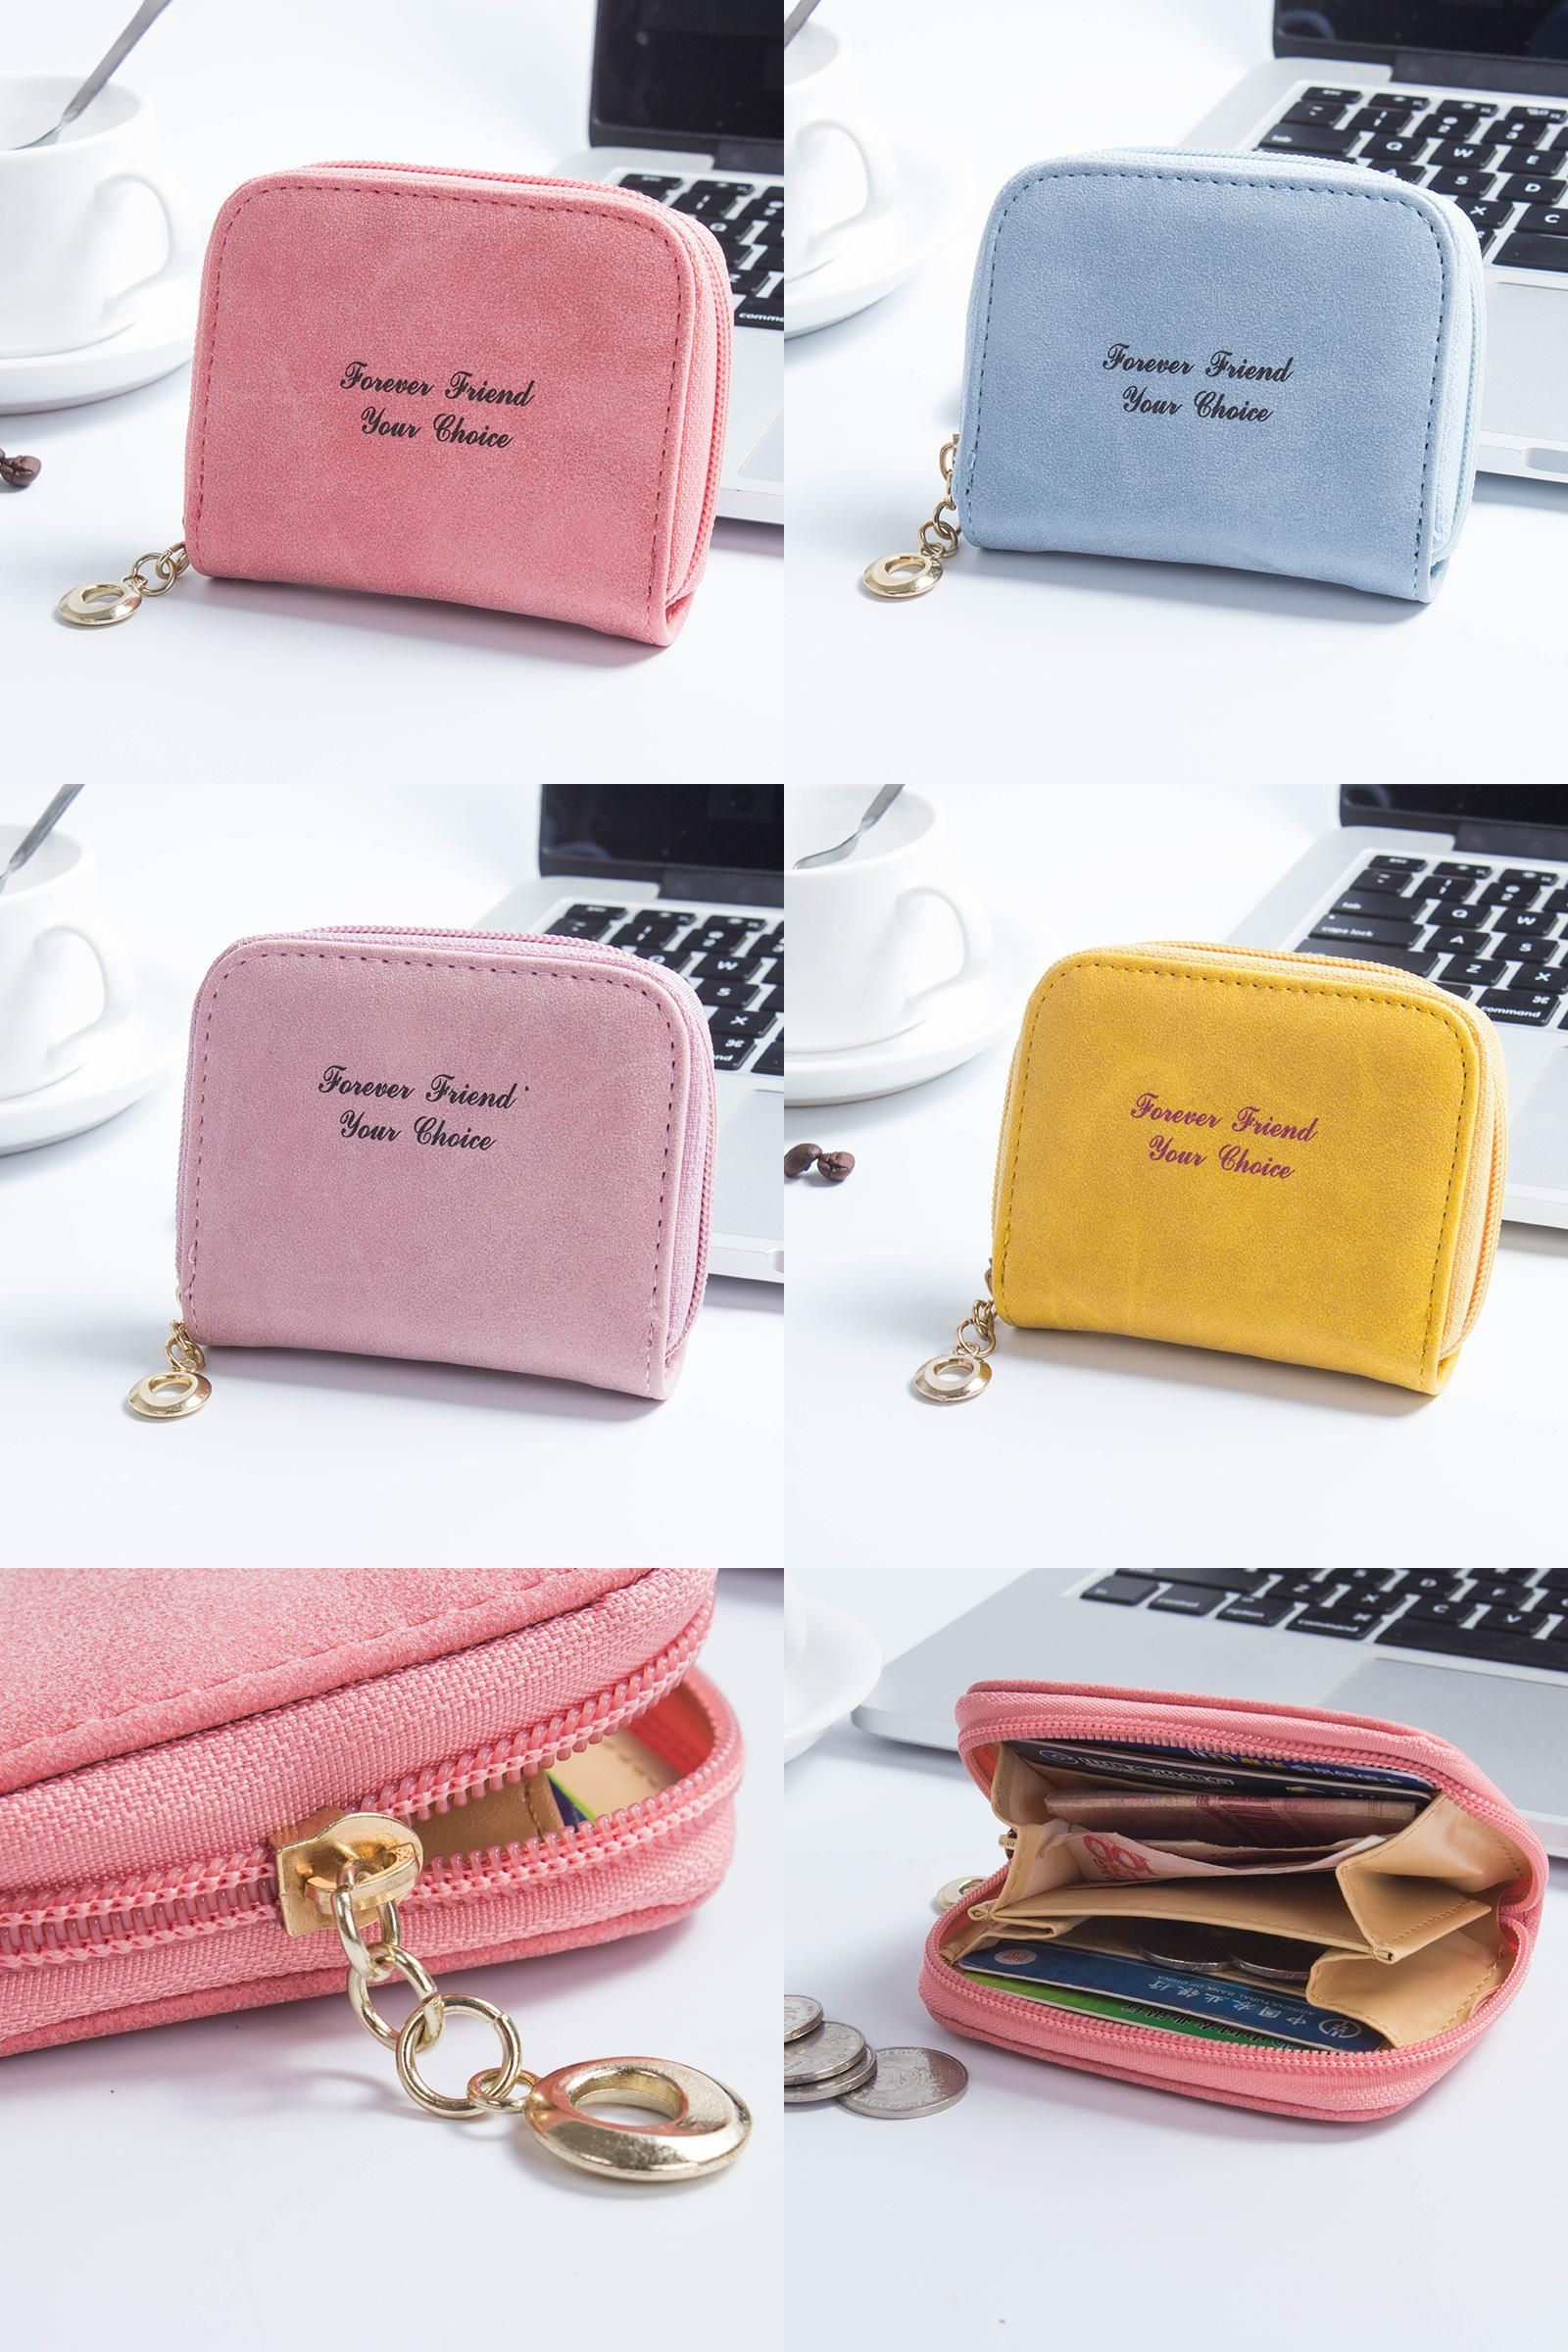 Women Men 3D Plush Mini Coin Change Purse Wallet Clutch Small Soft Bag With Hook